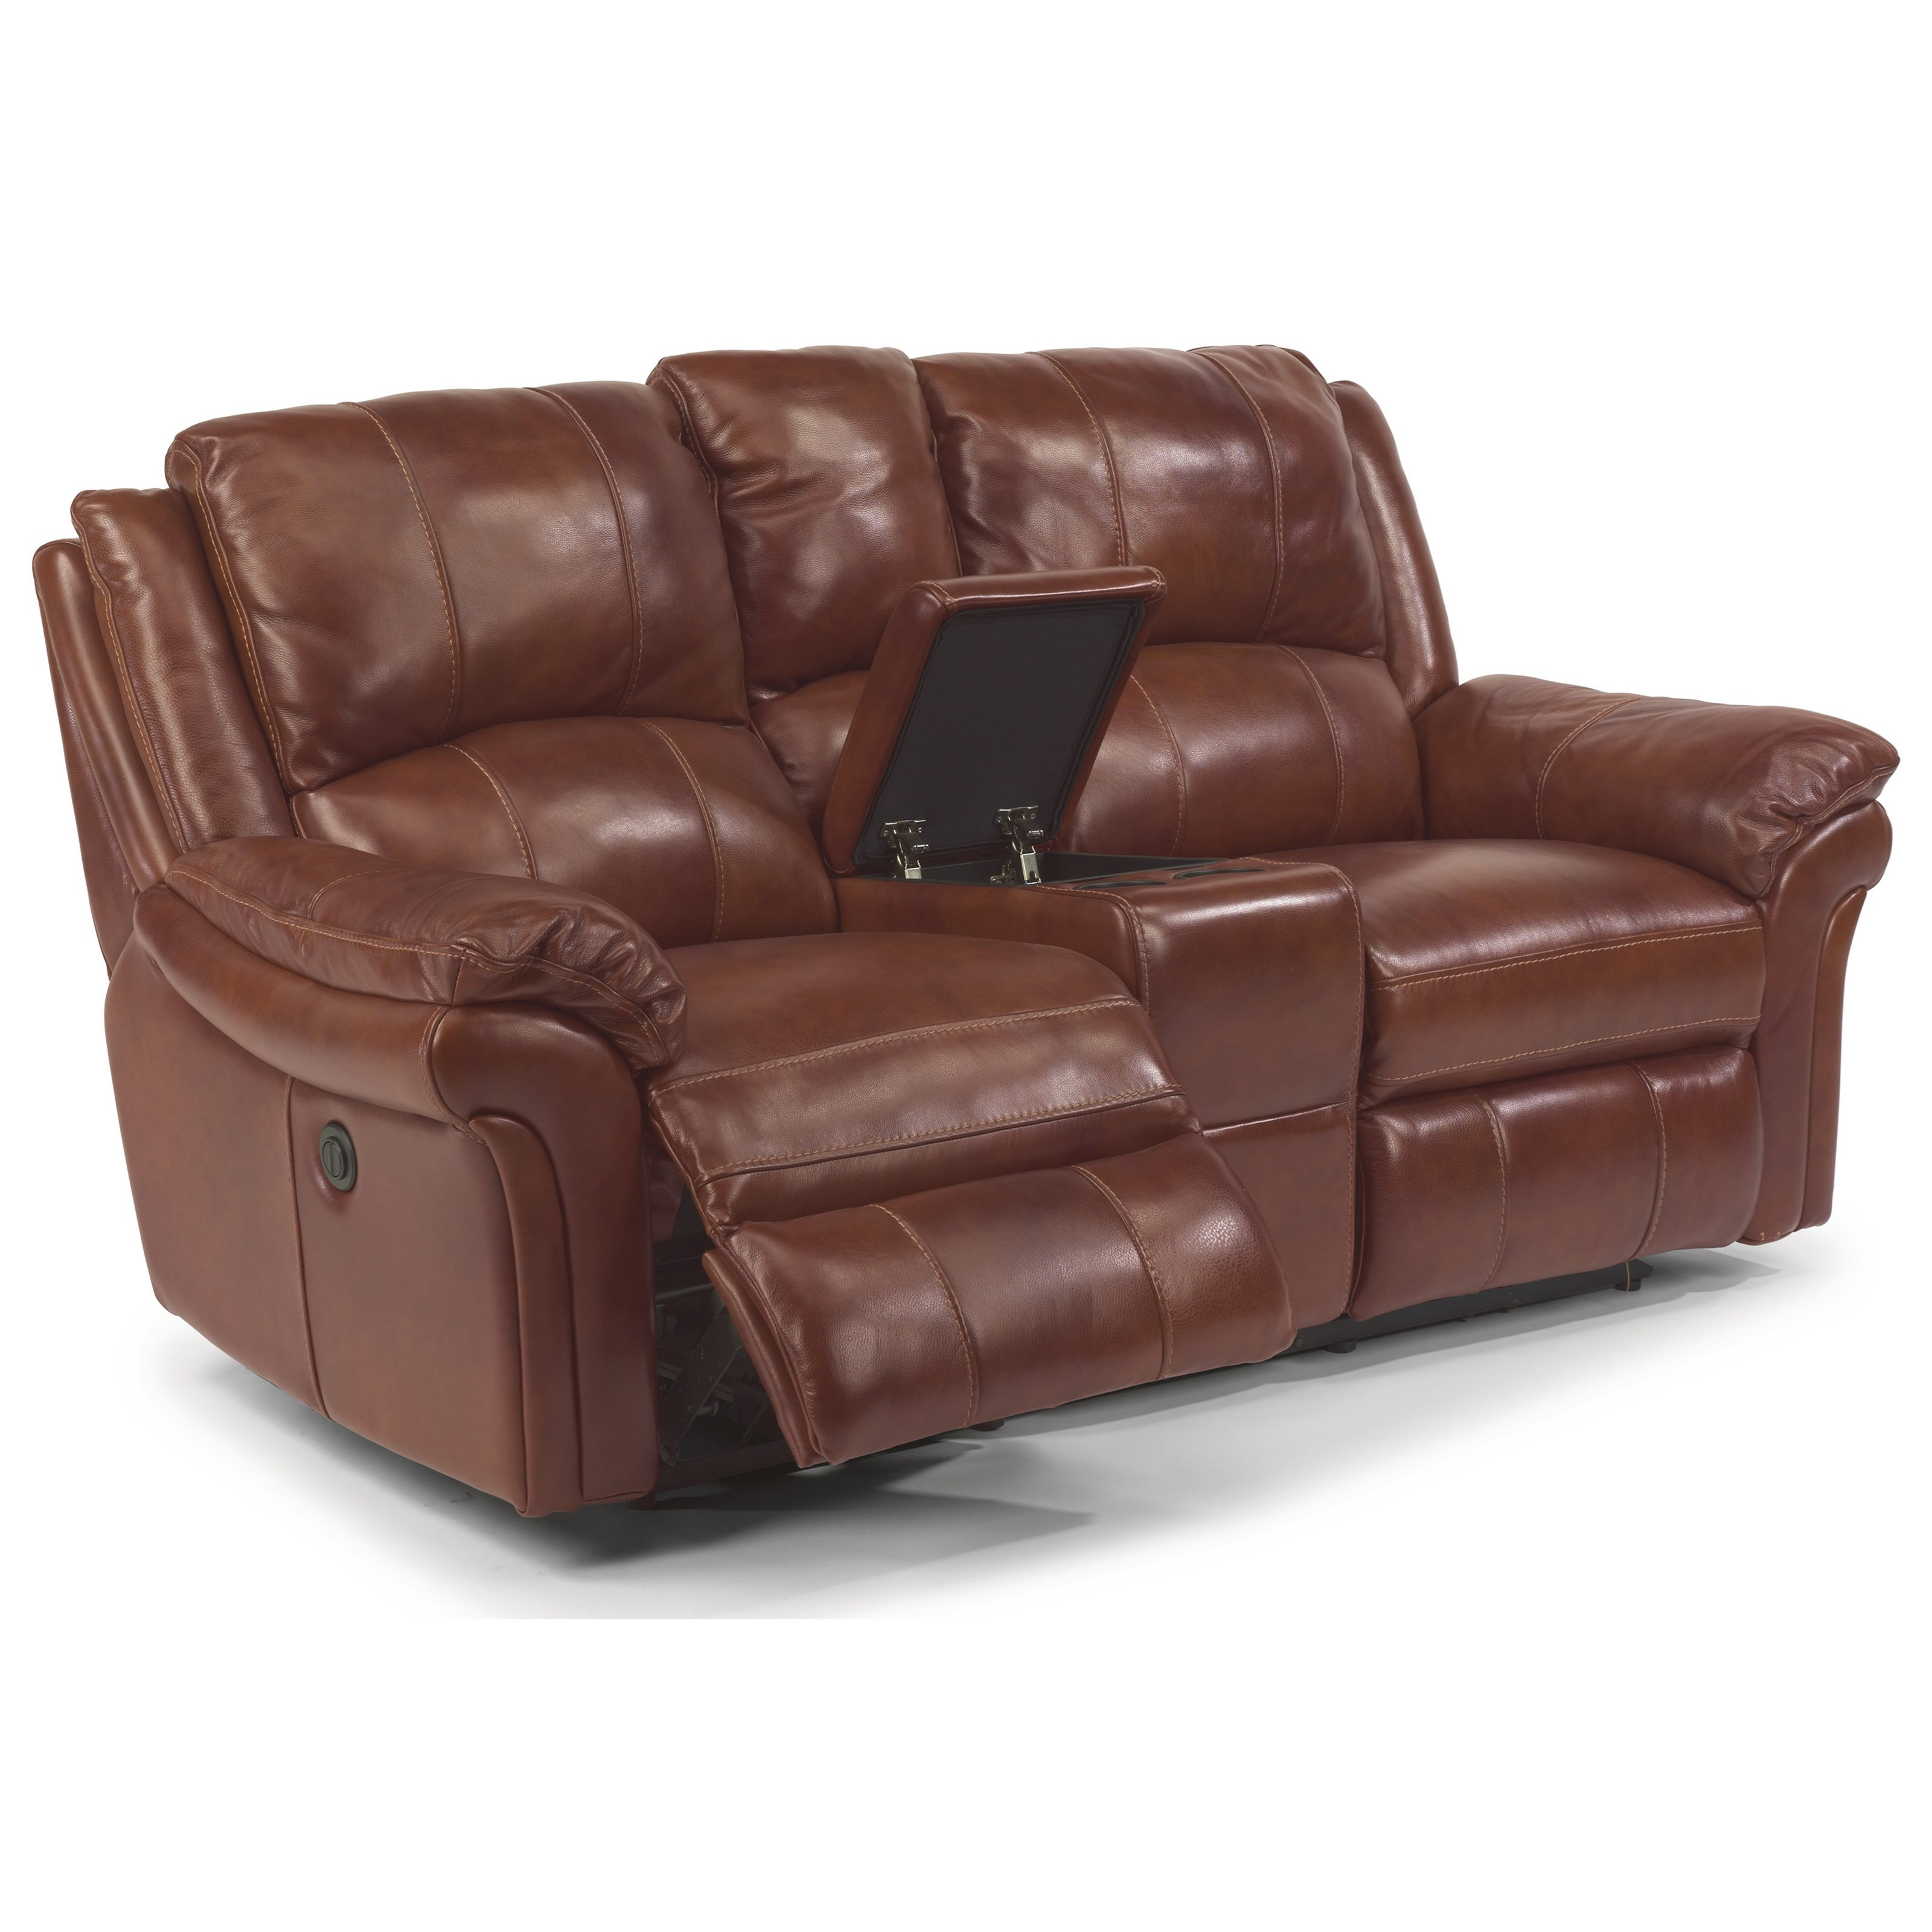 Flexsteel Latitudes - Dandridge Power Love Seat with Console - Item Number: 1351-604P-368-54